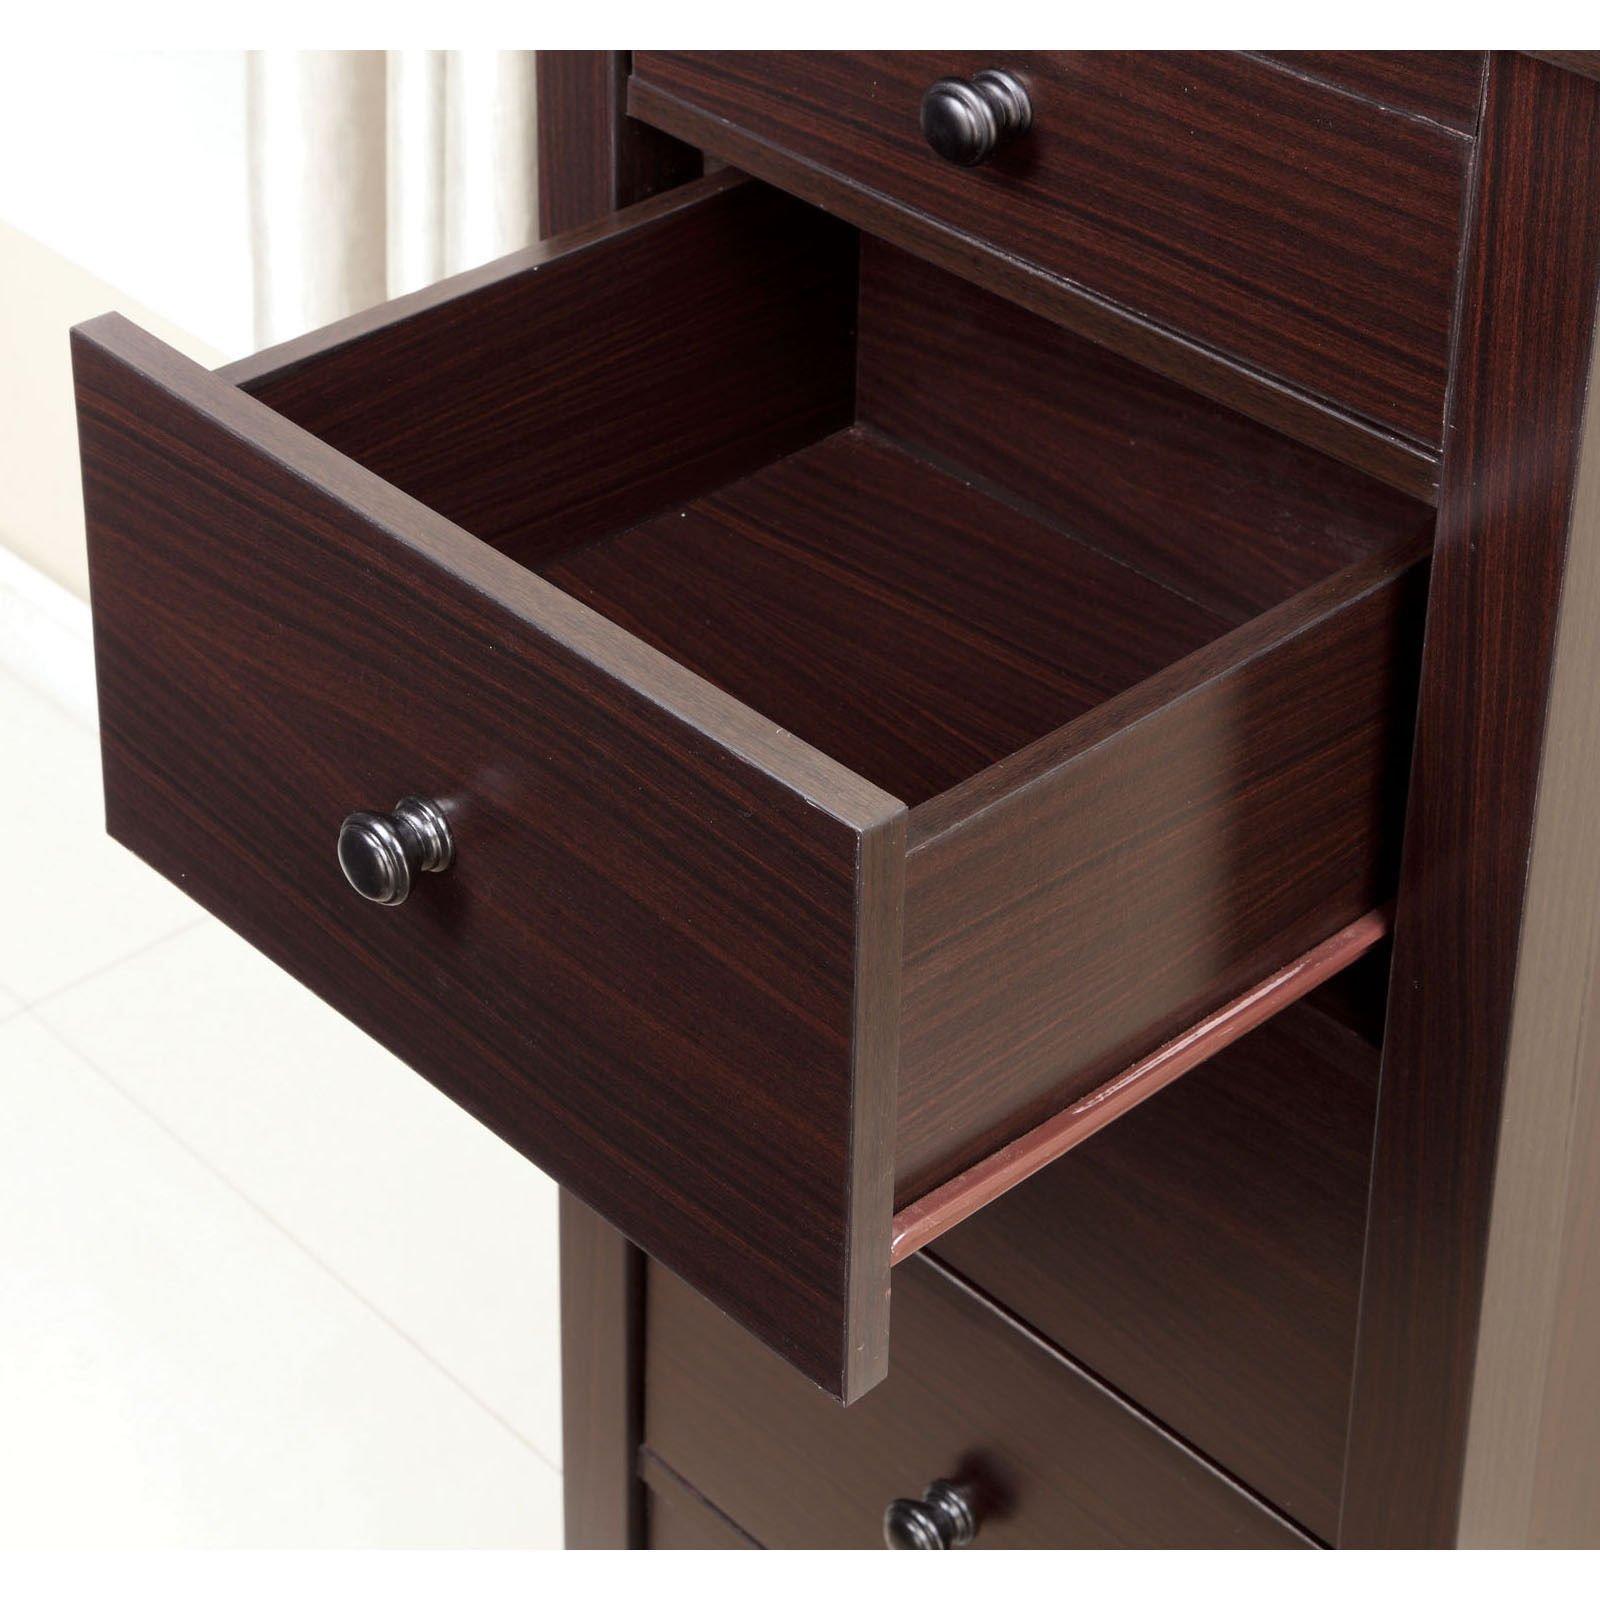 Arienth 5-Drawer Storage Chest, Espresso by Furniture of America